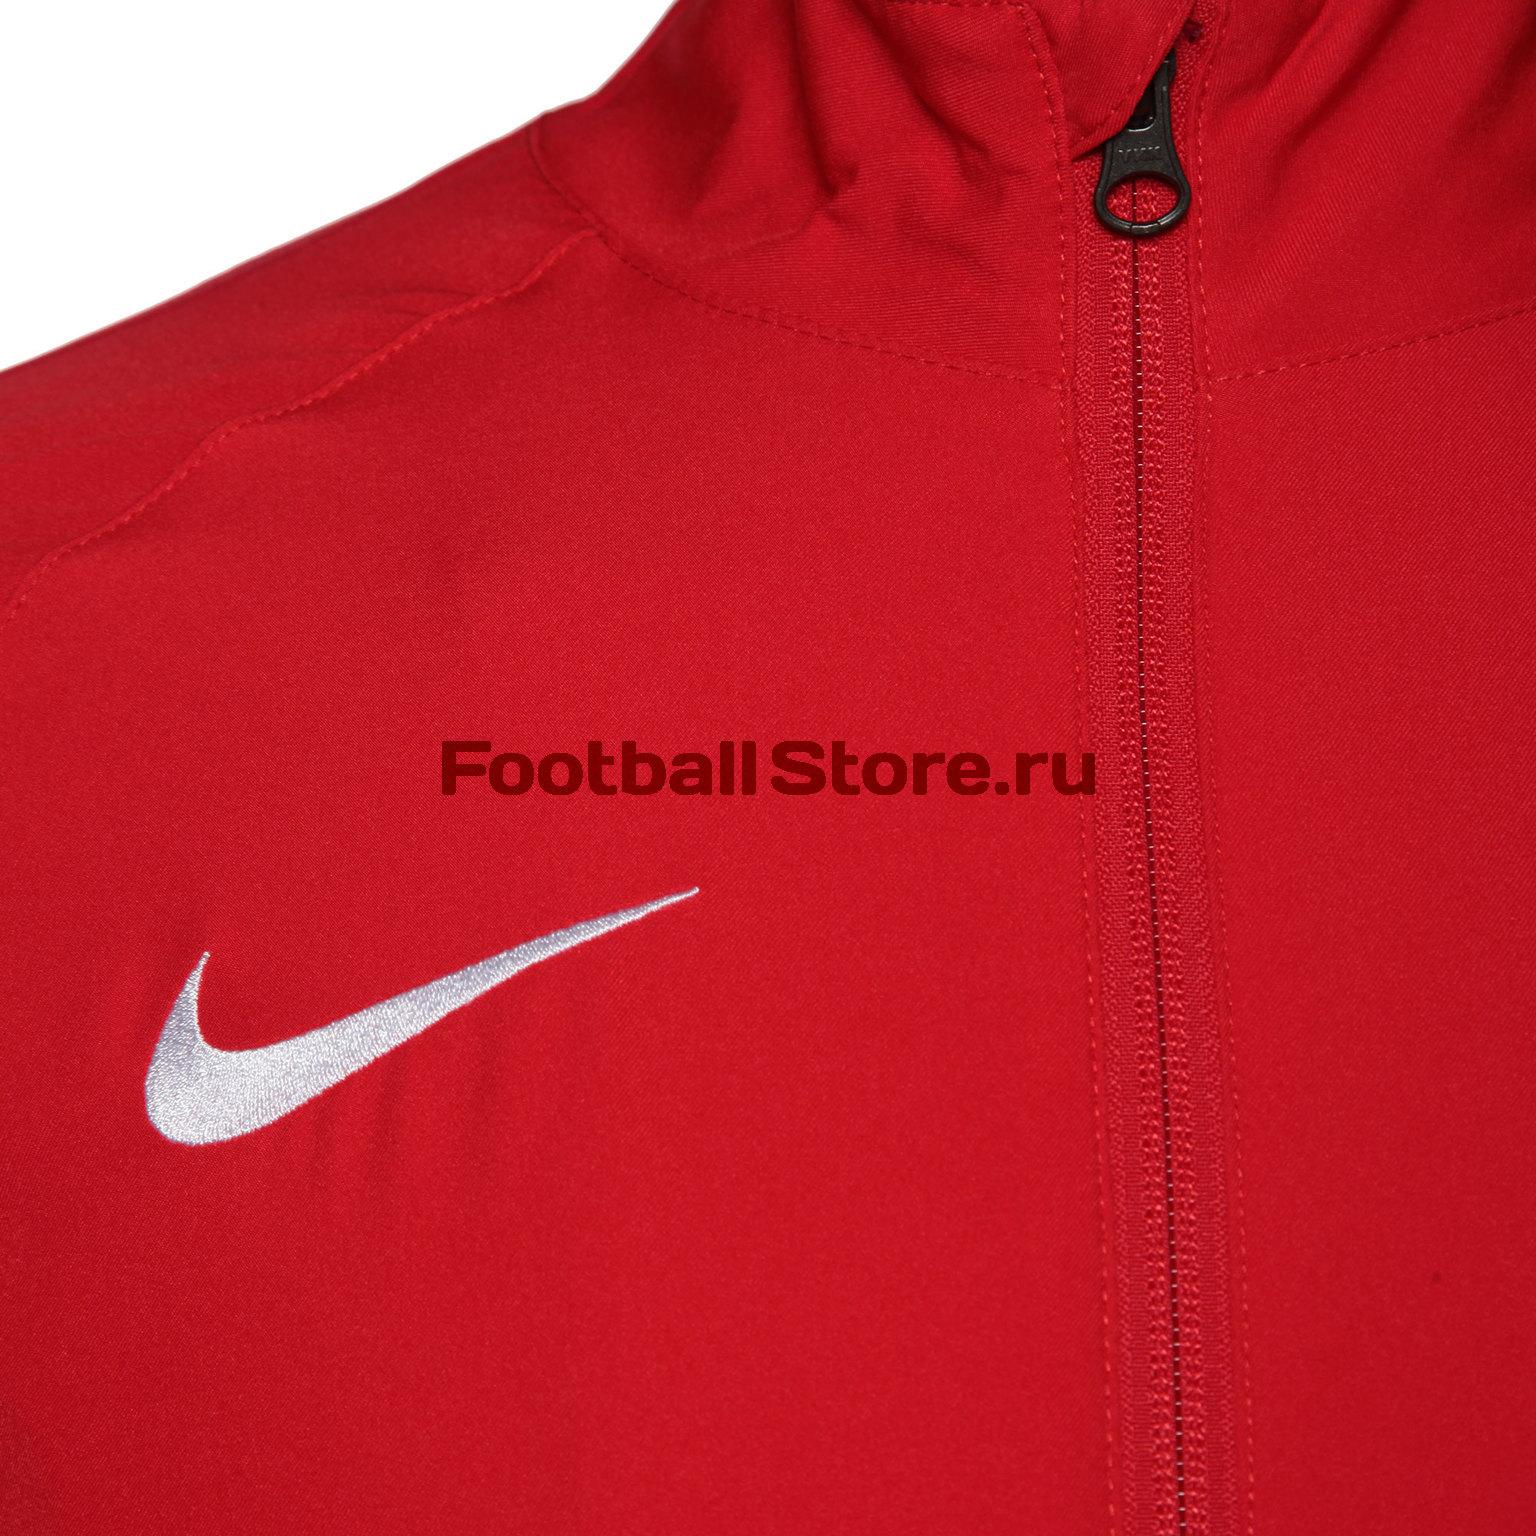 805f0ce2 Костюм спортивный Nike Dry Academy18 TRK Suit W 893709-657 – купить ...